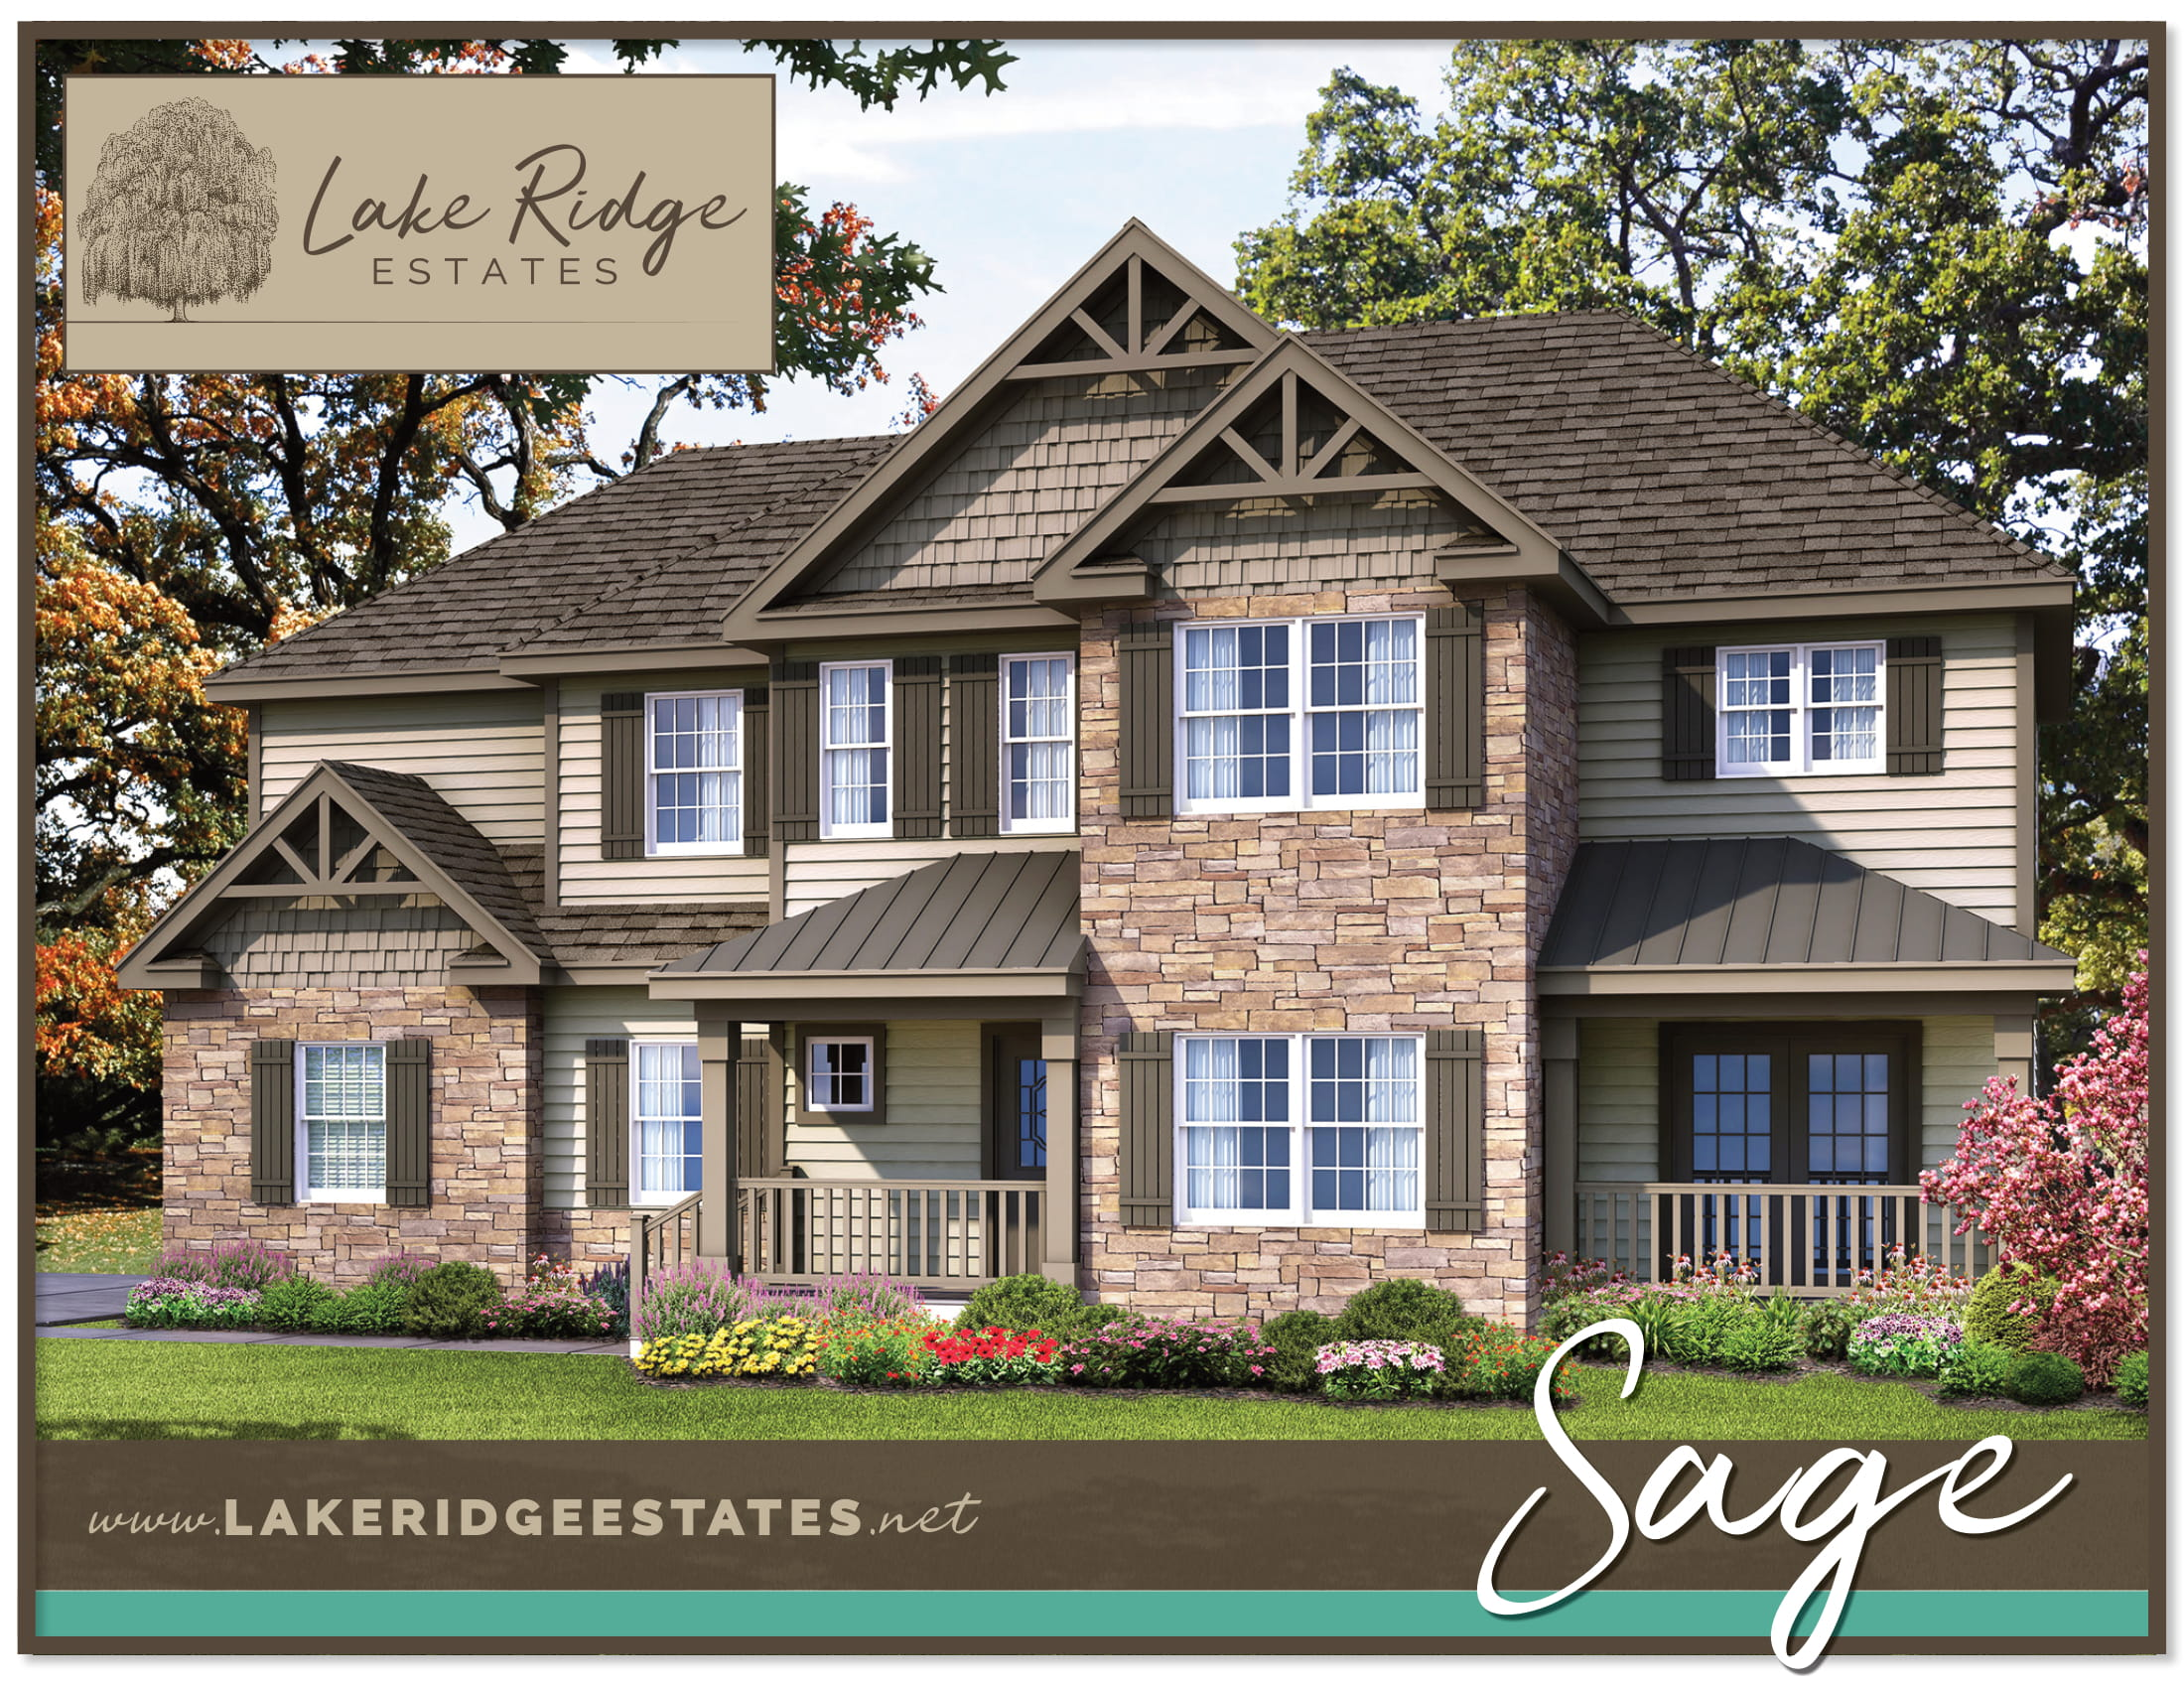 Christopher Ogden Middletown Ny Real Estate Thesage Lakeridge 1 1